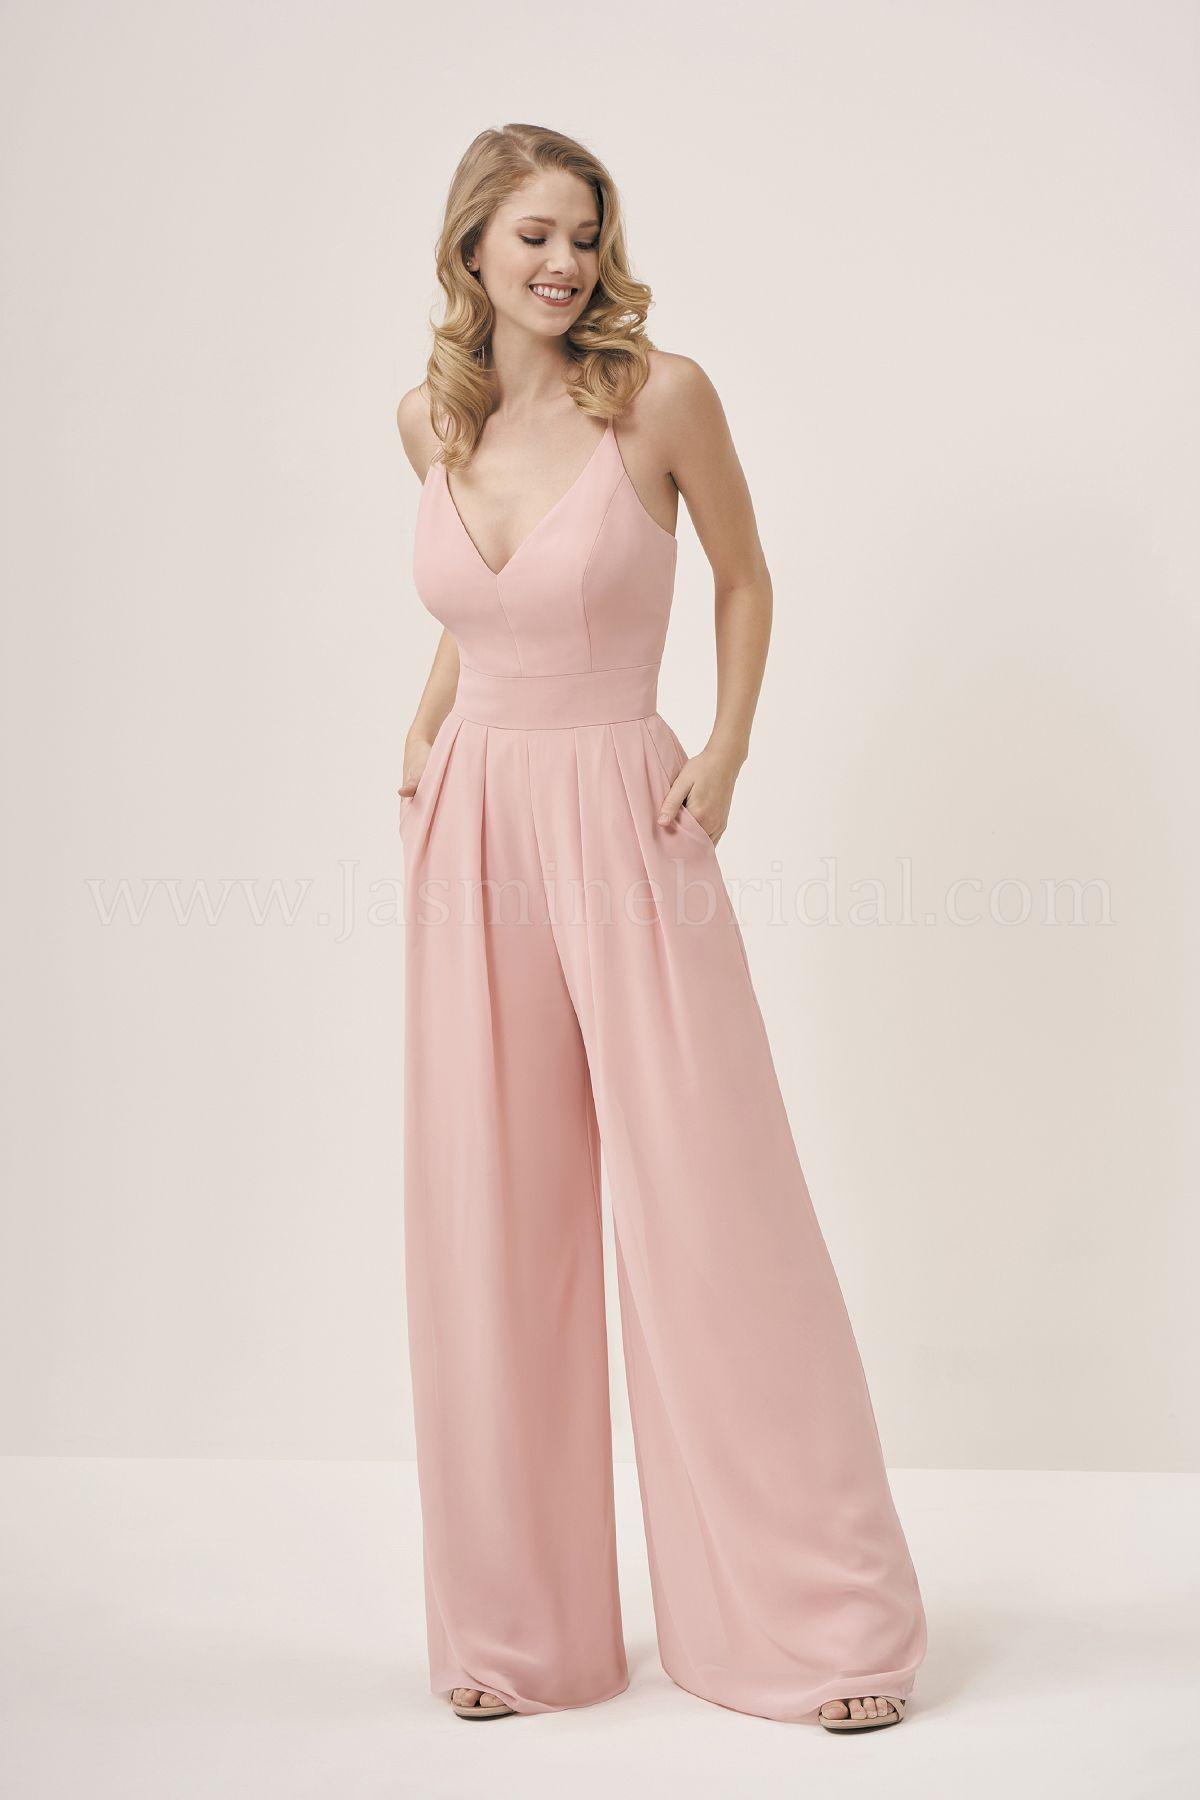 Jasmine Bridal | Jasmine Bridesmaids Style P196053 in Rose | Wide ...